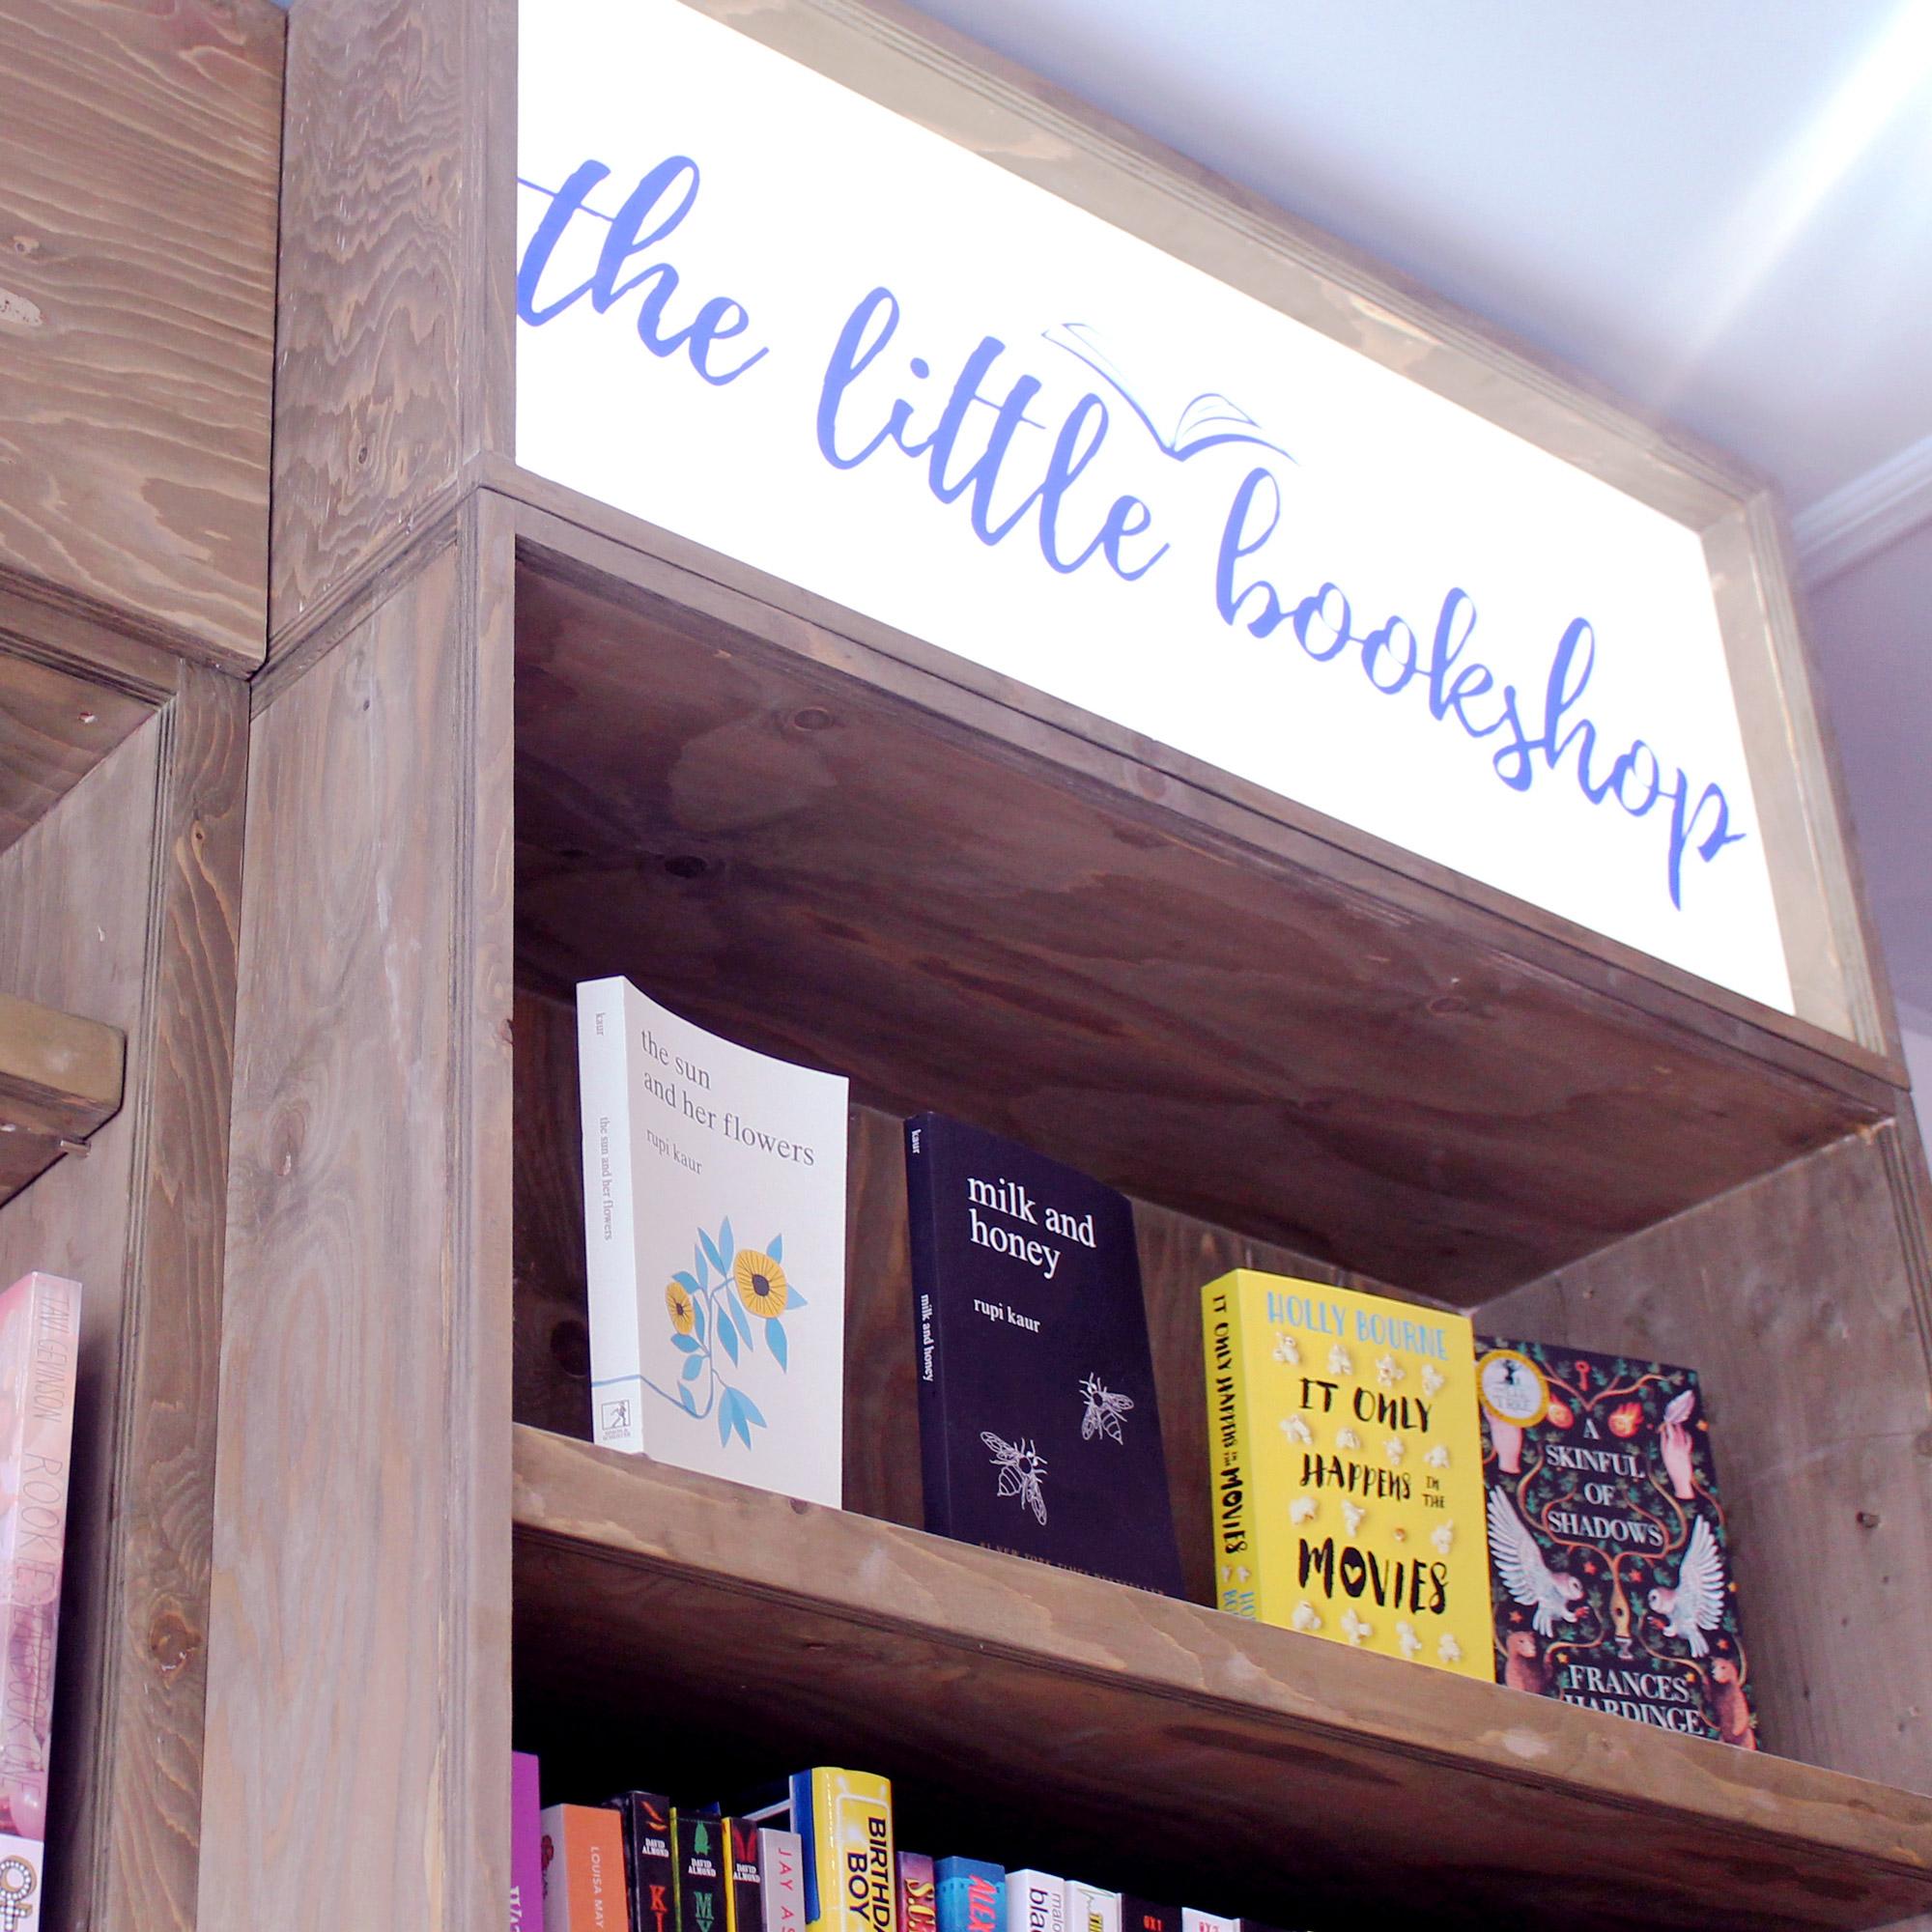 The-Little-Bookshop-Shop-Workshop-4-Web.jpg